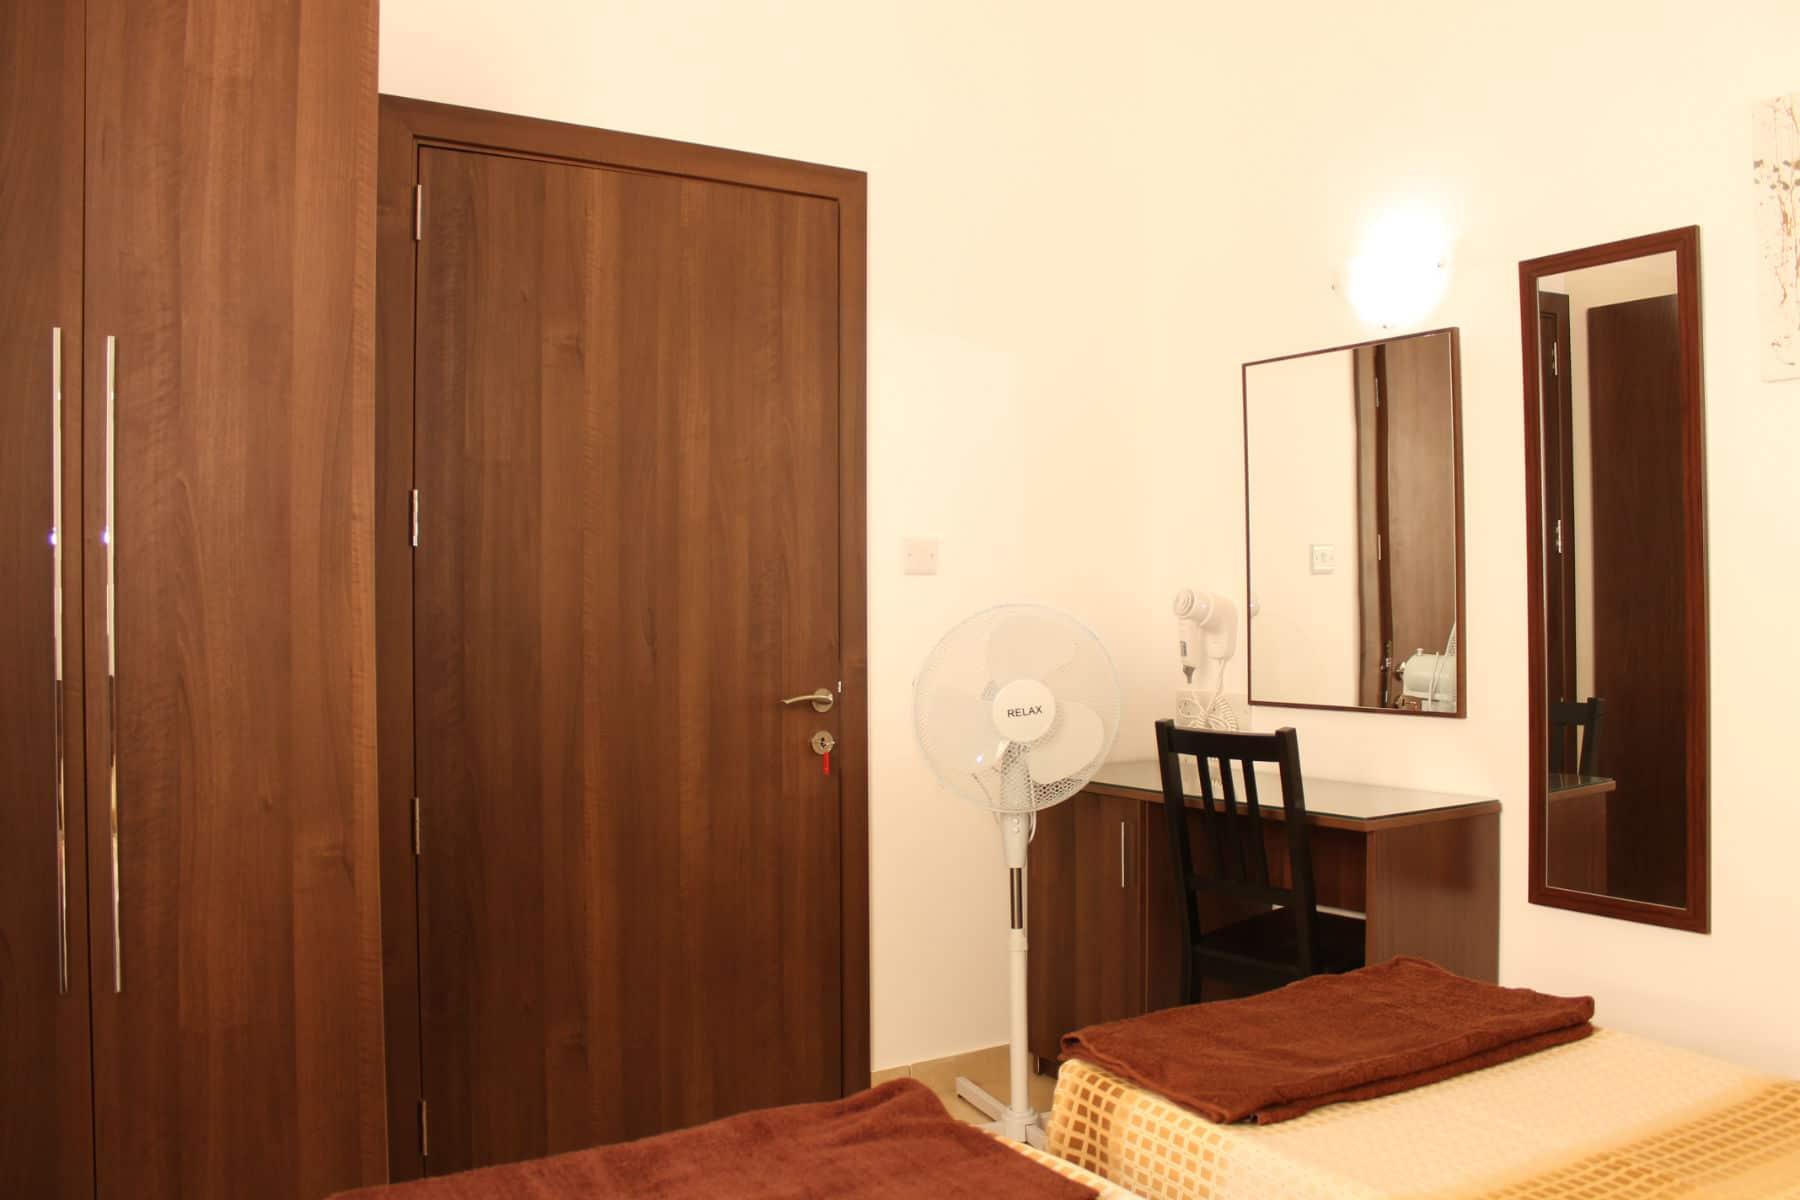 Main bedroom with waldrobe, vanity desk, fan and hairdryer ...